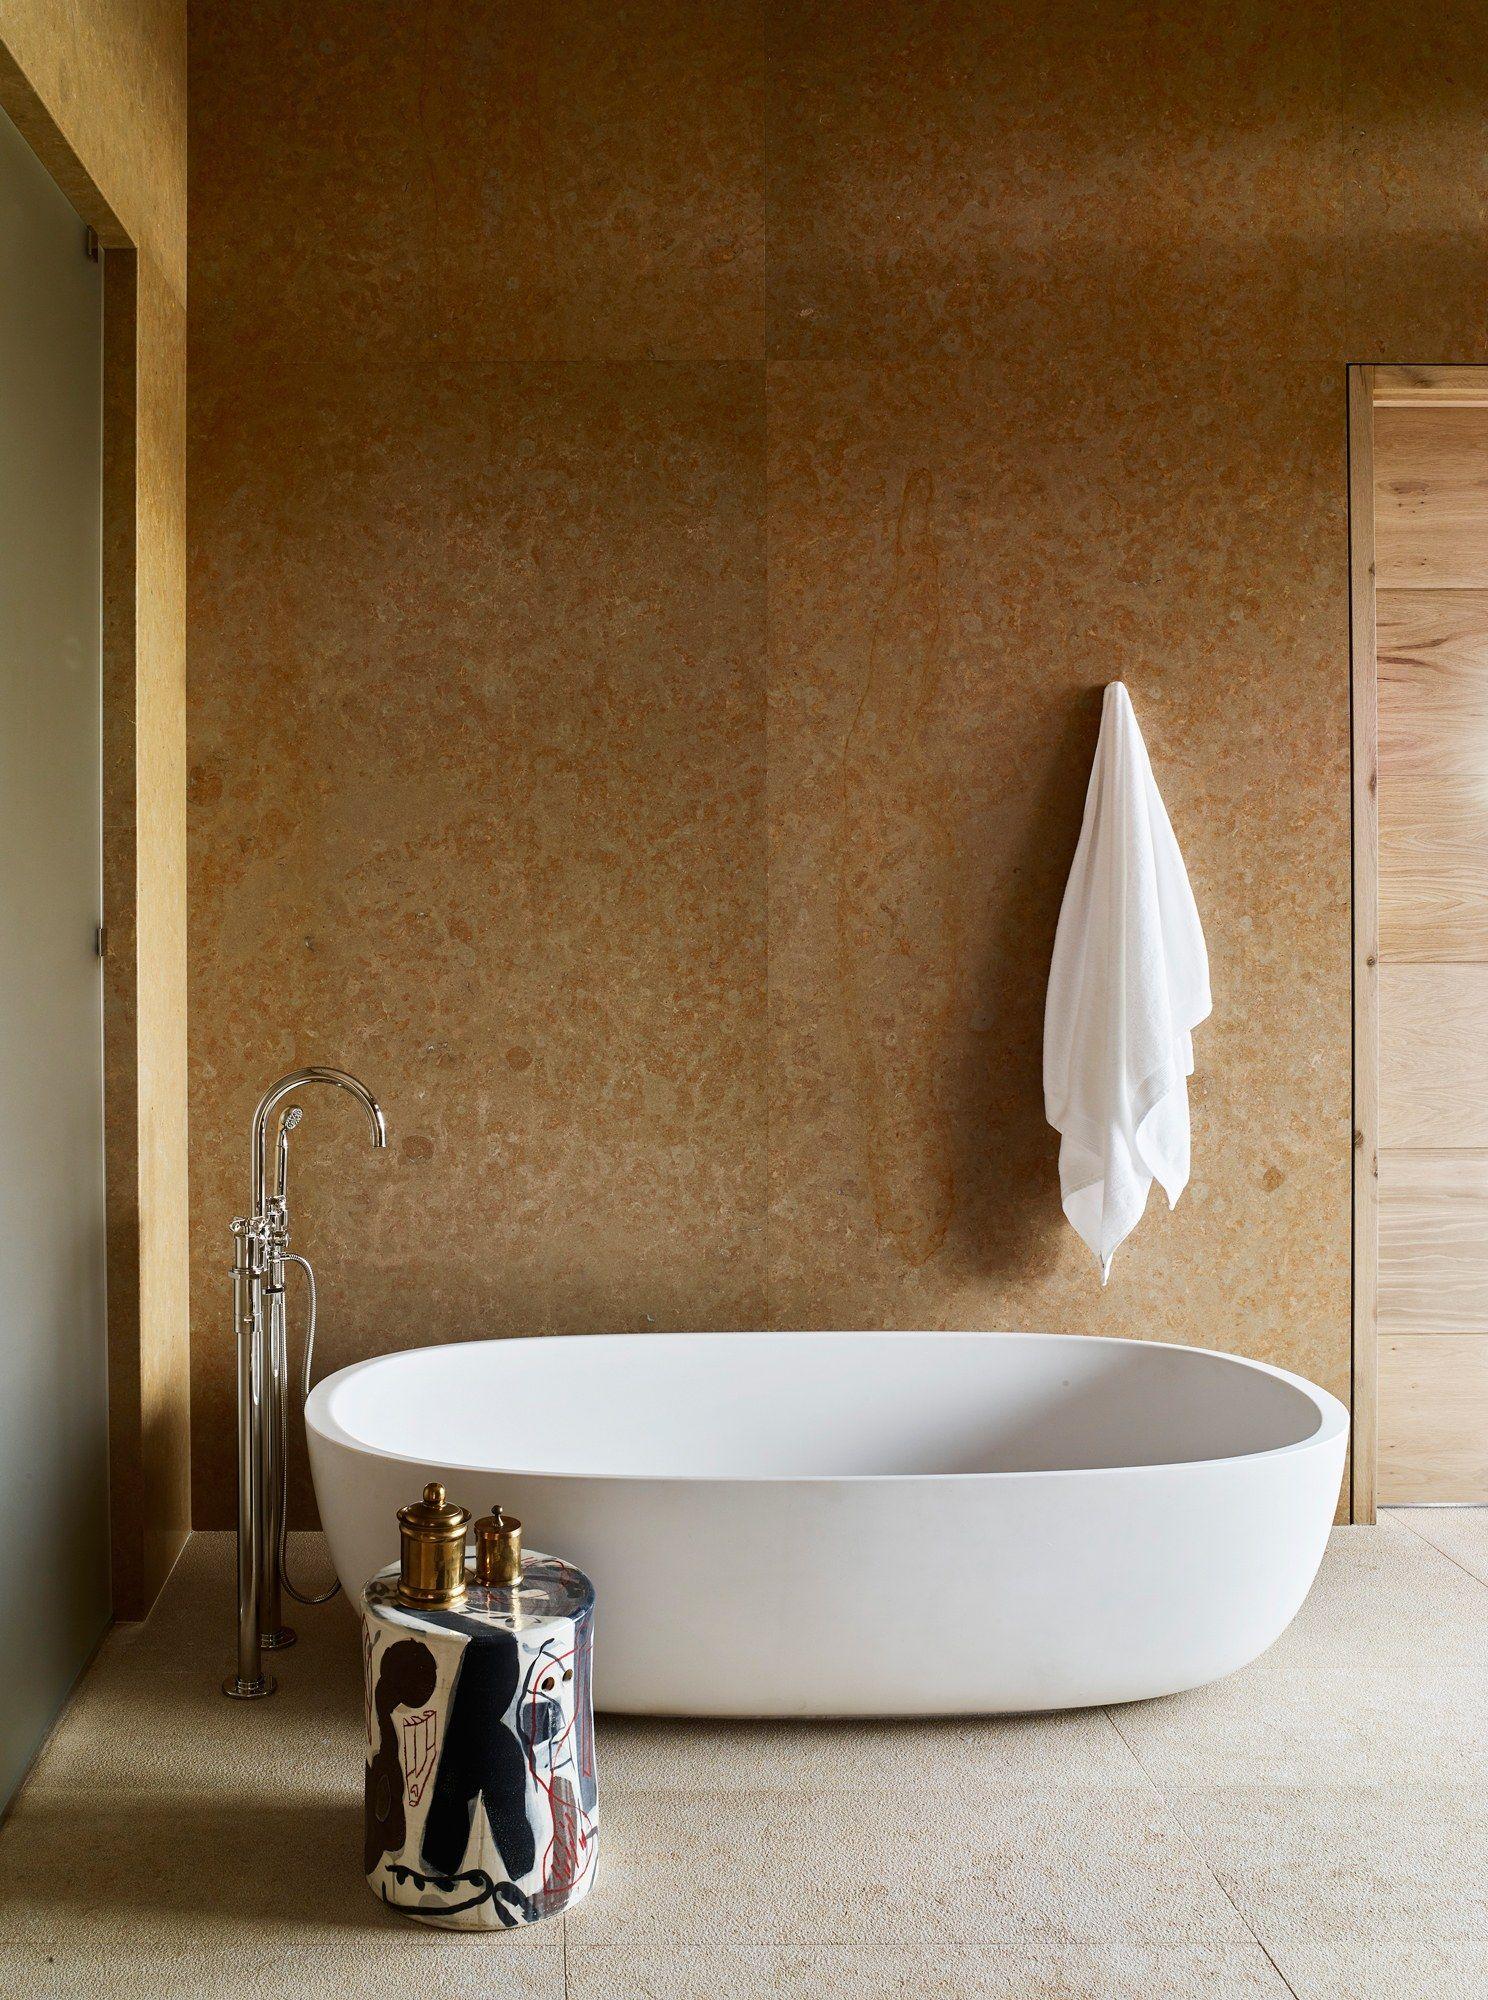 Is This The New Must Have Bathtub Stylish Bathroom Hotels Design Bathroom Wall Panels